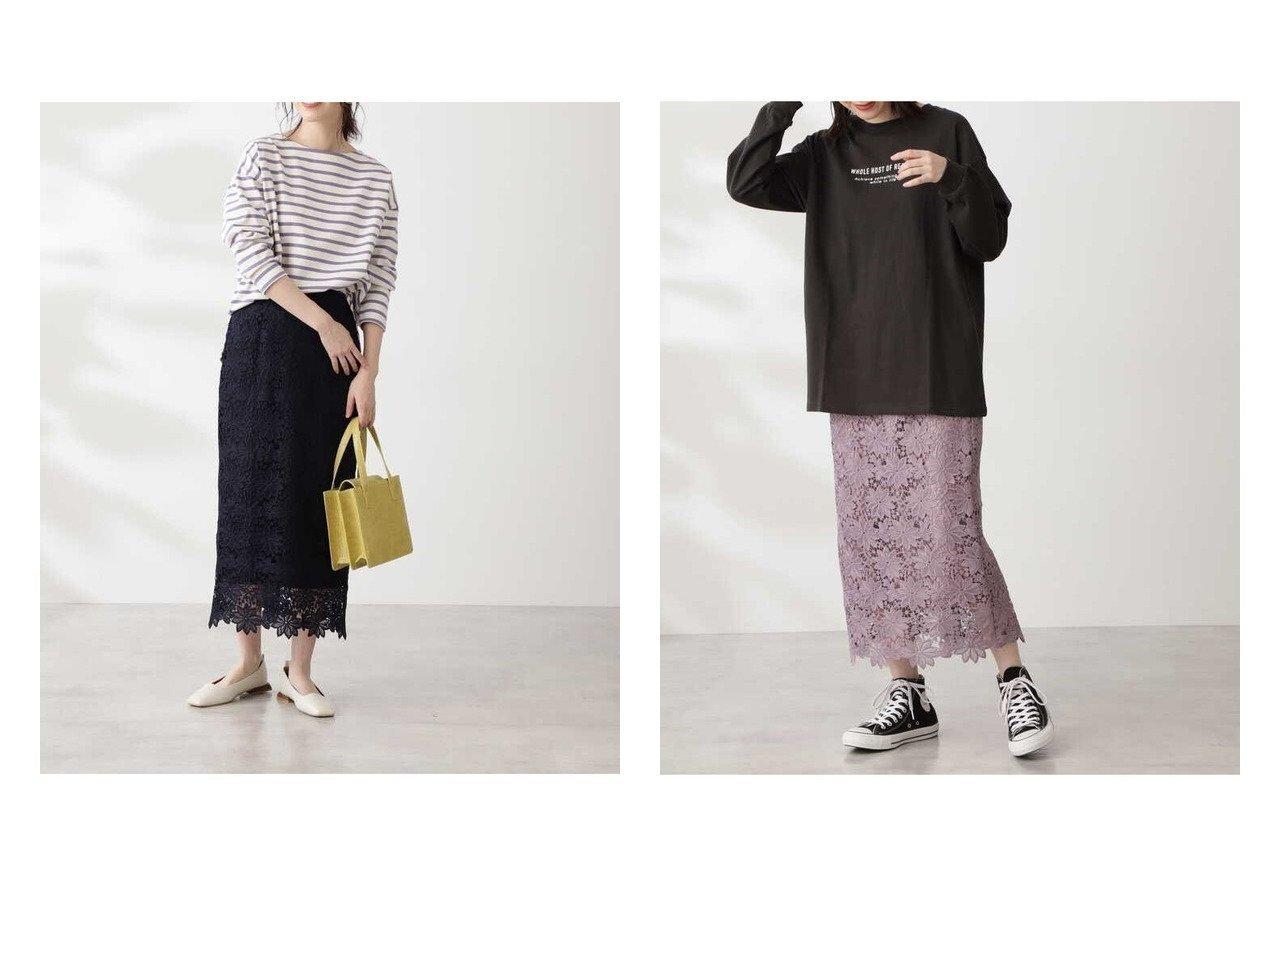 【N.Natural Beauty basic/エヌ ナチュラルビューティーベーシック】のケミカルレースロングスカート 【スカート】おすすめ!人気、トレンド・レディースファッションの通販 おすすめで人気の流行・トレンド、ファッションの通販商品 メンズファッション・キッズファッション・インテリア・家具・レディースファッション・服の通販 founy(ファニー) https://founy.com/ ファッション Fashion レディースファッション WOMEN スカート Skirt ロングスカート Long Skirt カットソー ケミカル スカラップ ストレート フェミニン レース ロング 人気 定番 Standard |ID:crp329100000027838